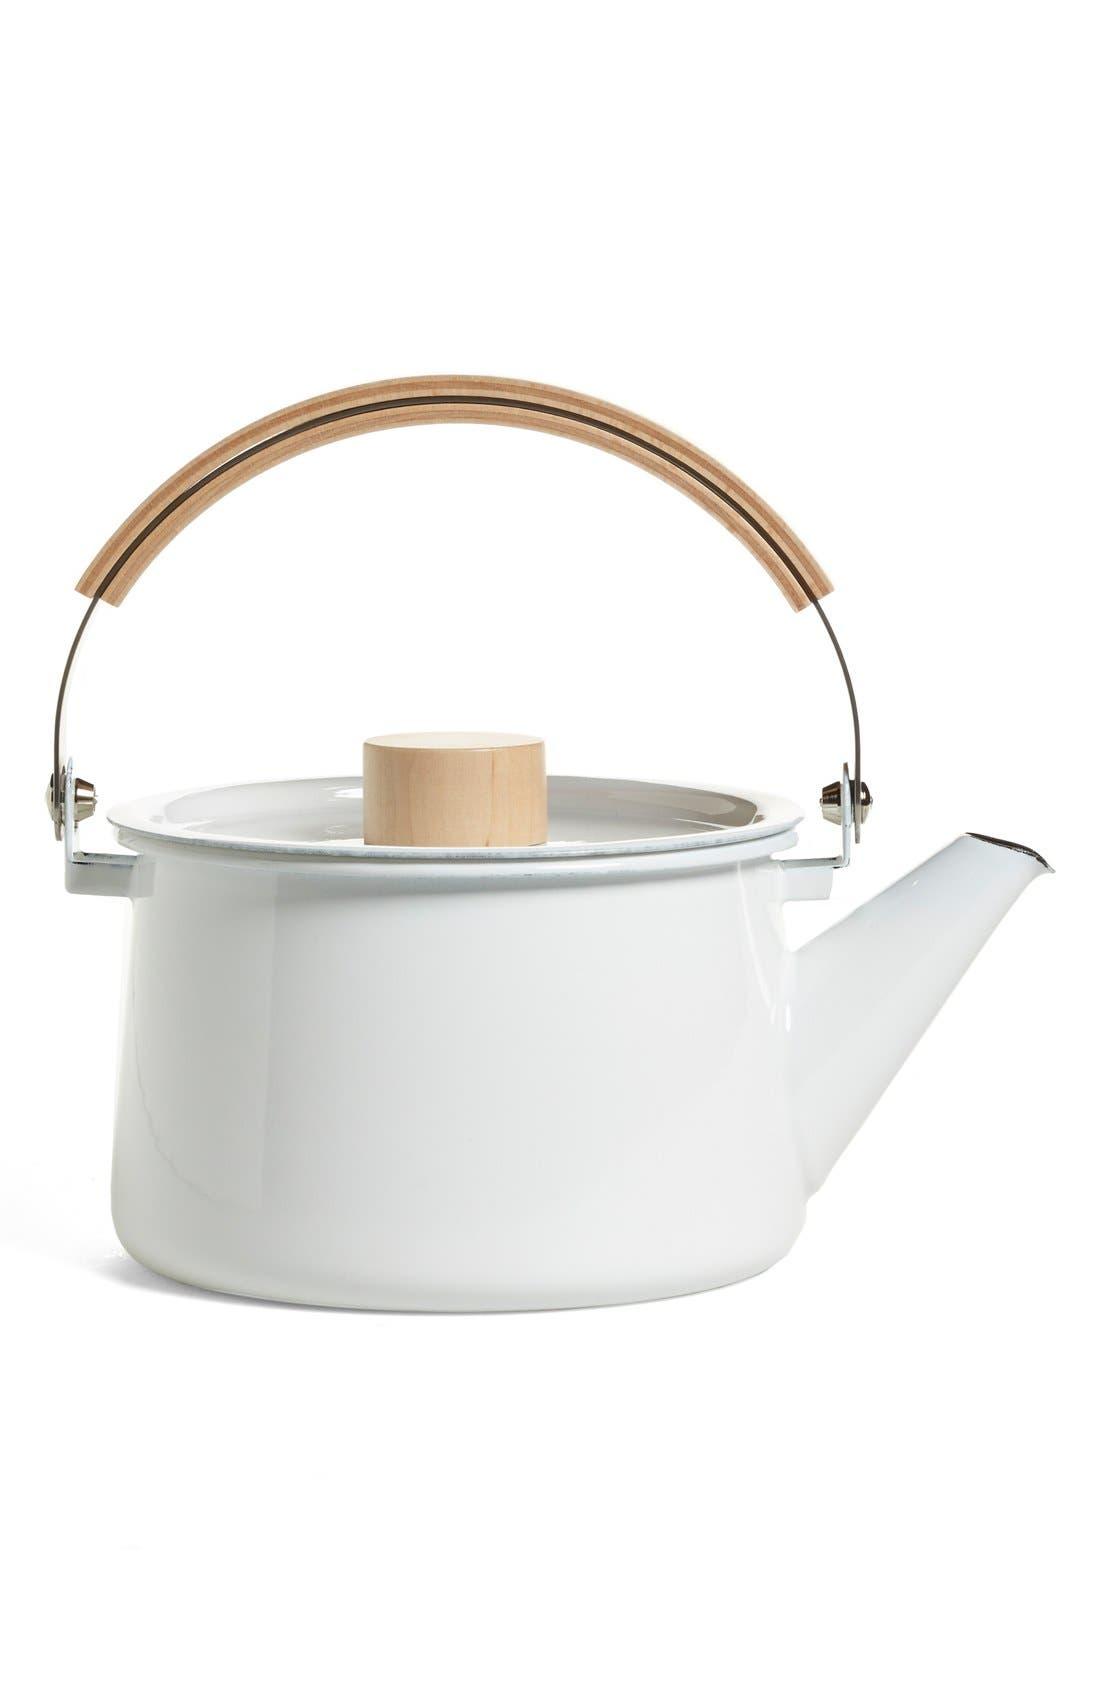 Alternate Image 1 Selected - saikai 'Kaico' Enameled Tea Kettle